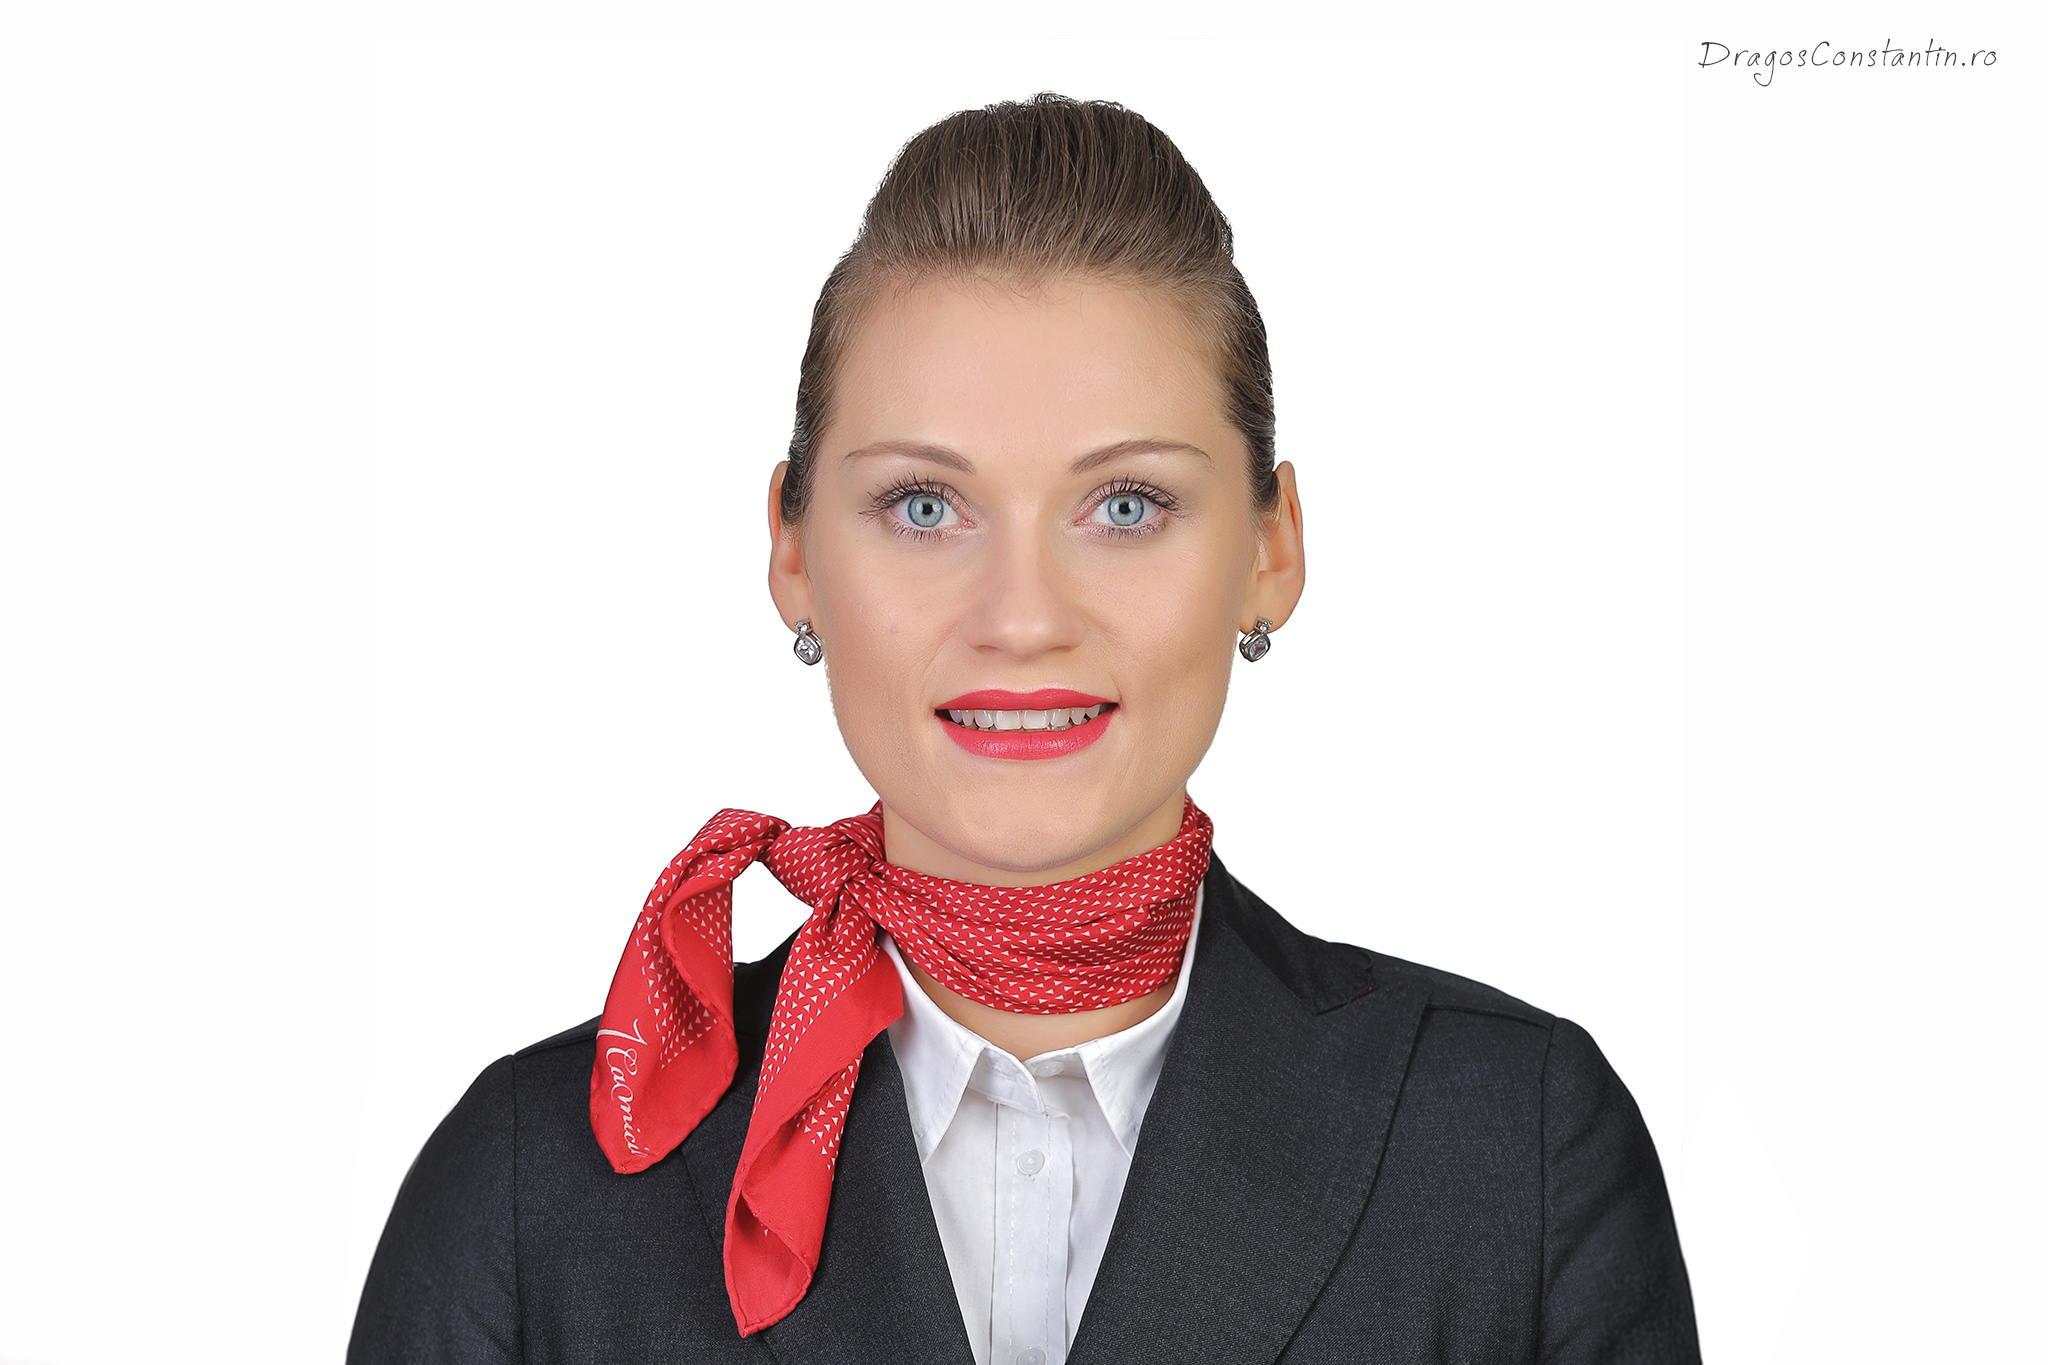 Fotografie insotitor de bord Steward - Flight attendant Photography